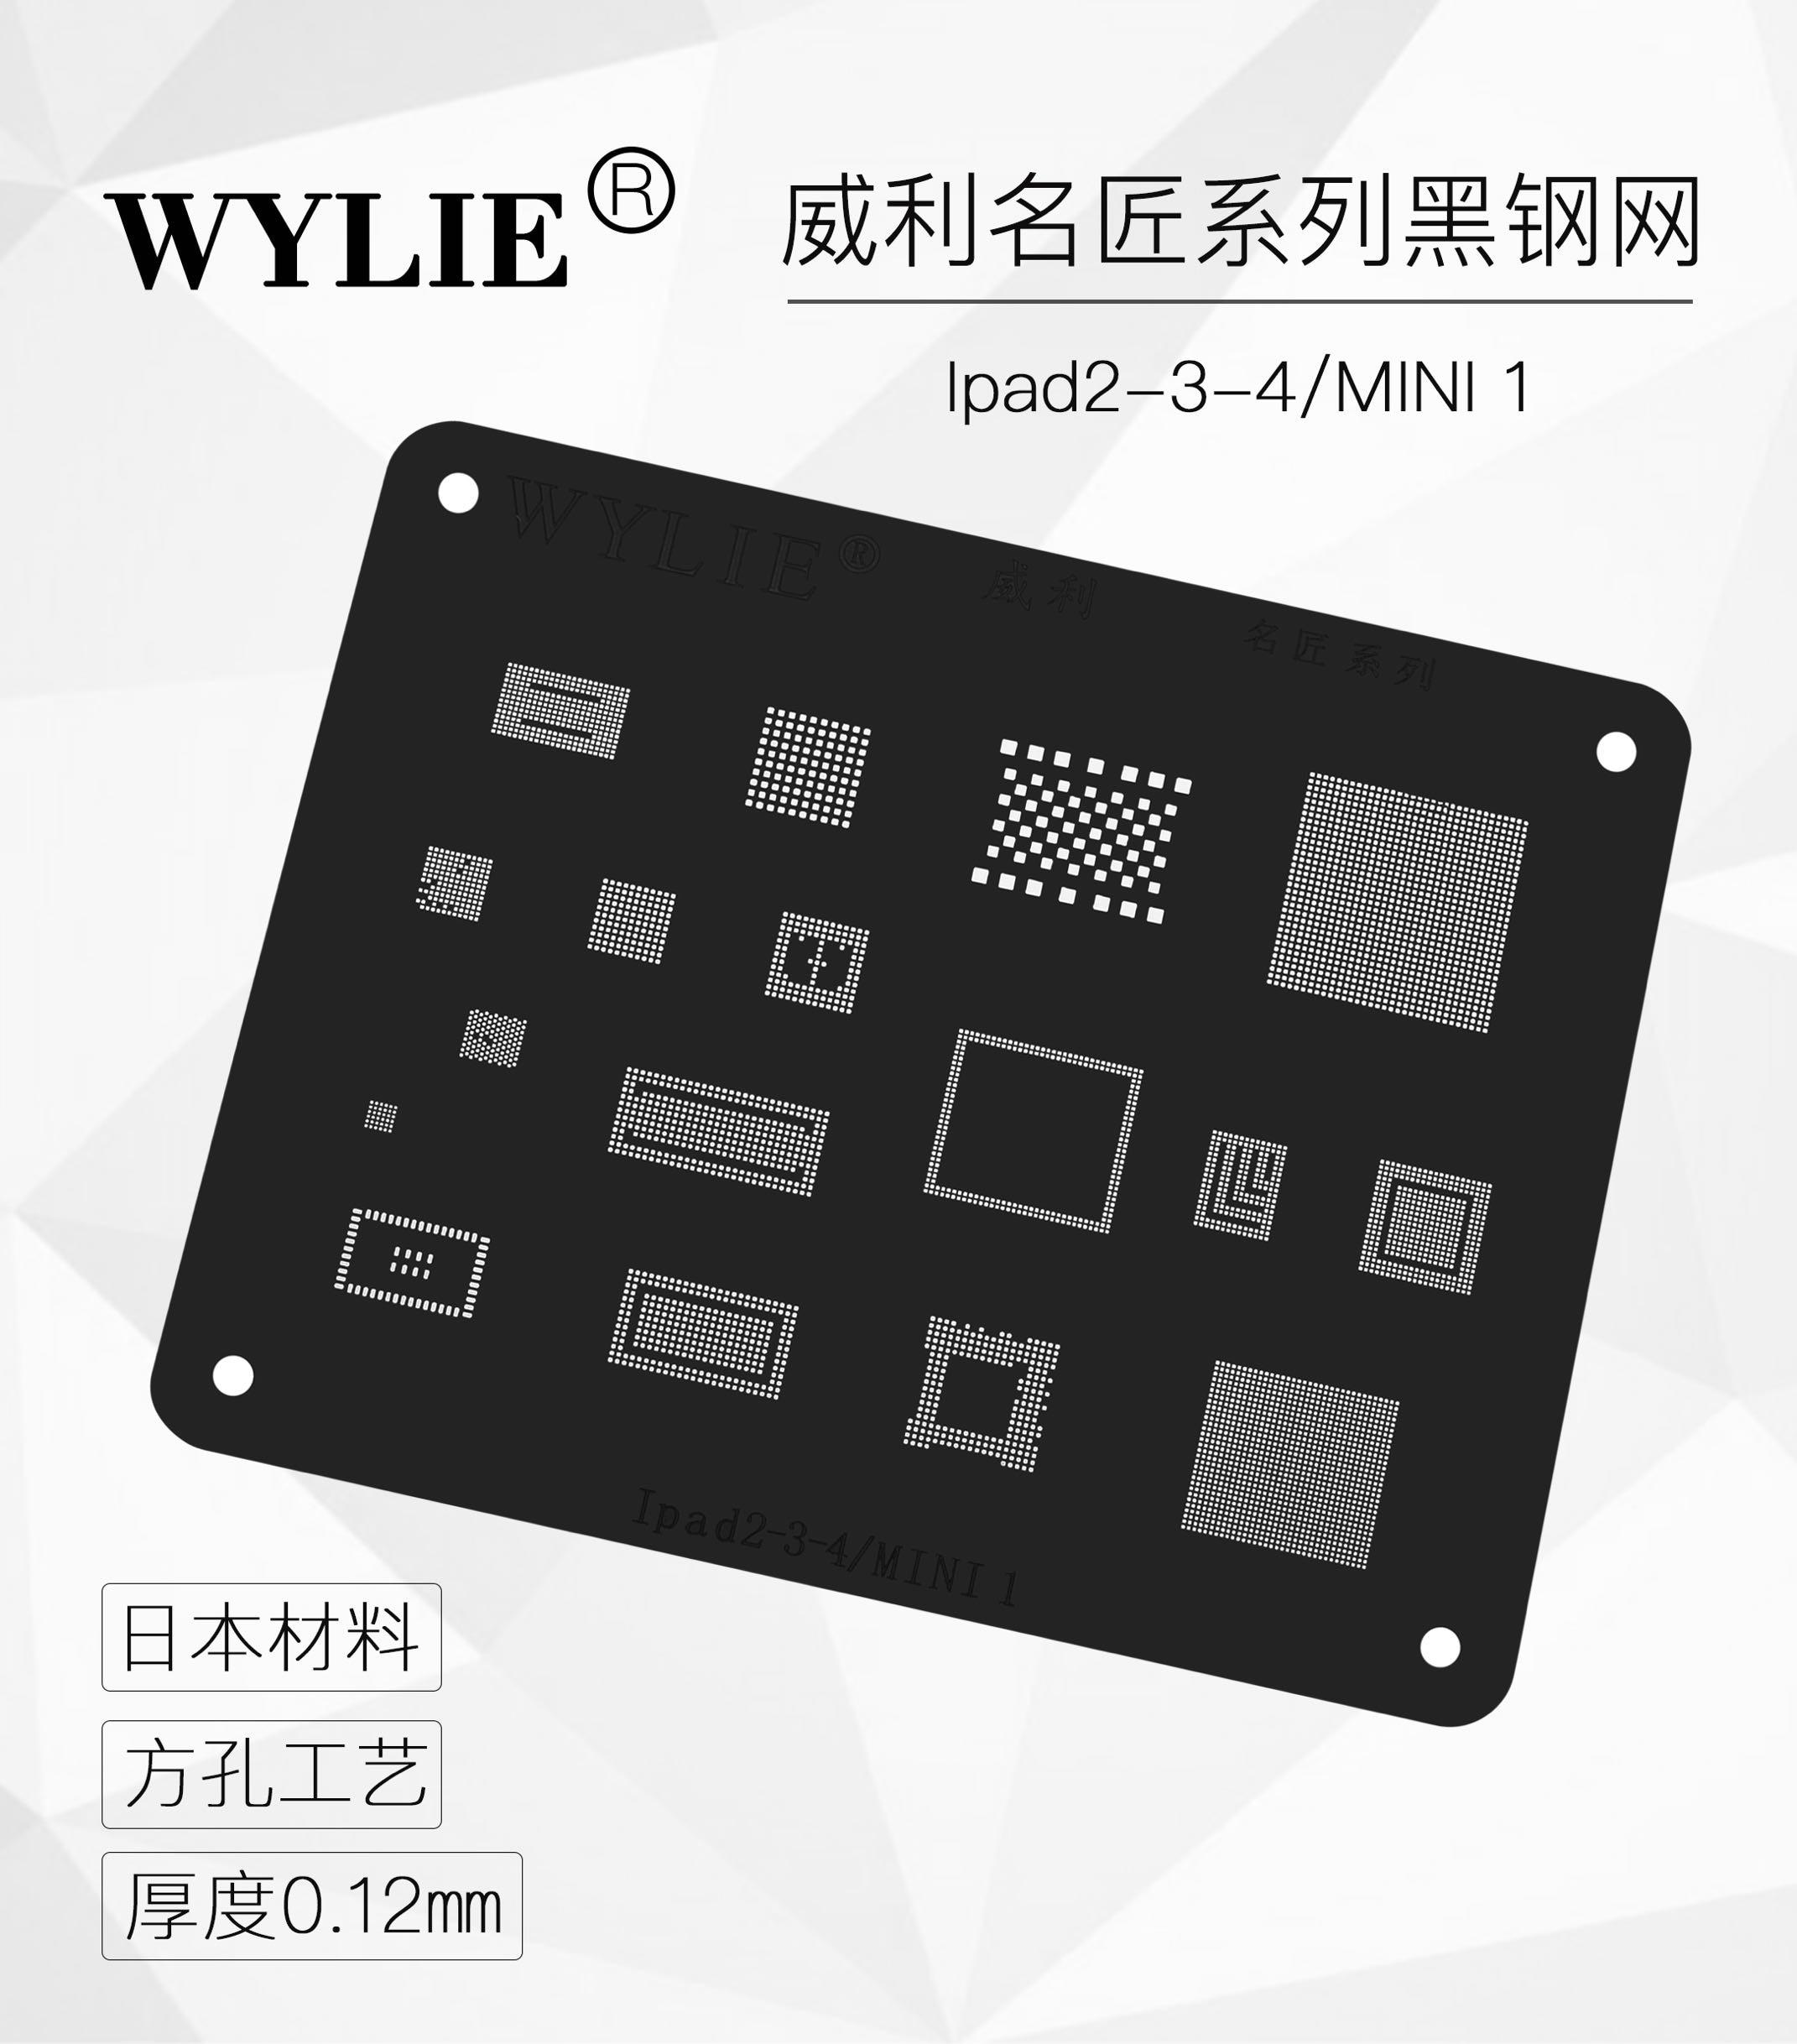 Wylie BGA Reballing Stencil for  ipad 6 Air2 5 Air 4 3 2 mini pro 12.9 10.5 9.7 IC Chip Power U2 NAND PCIE 3